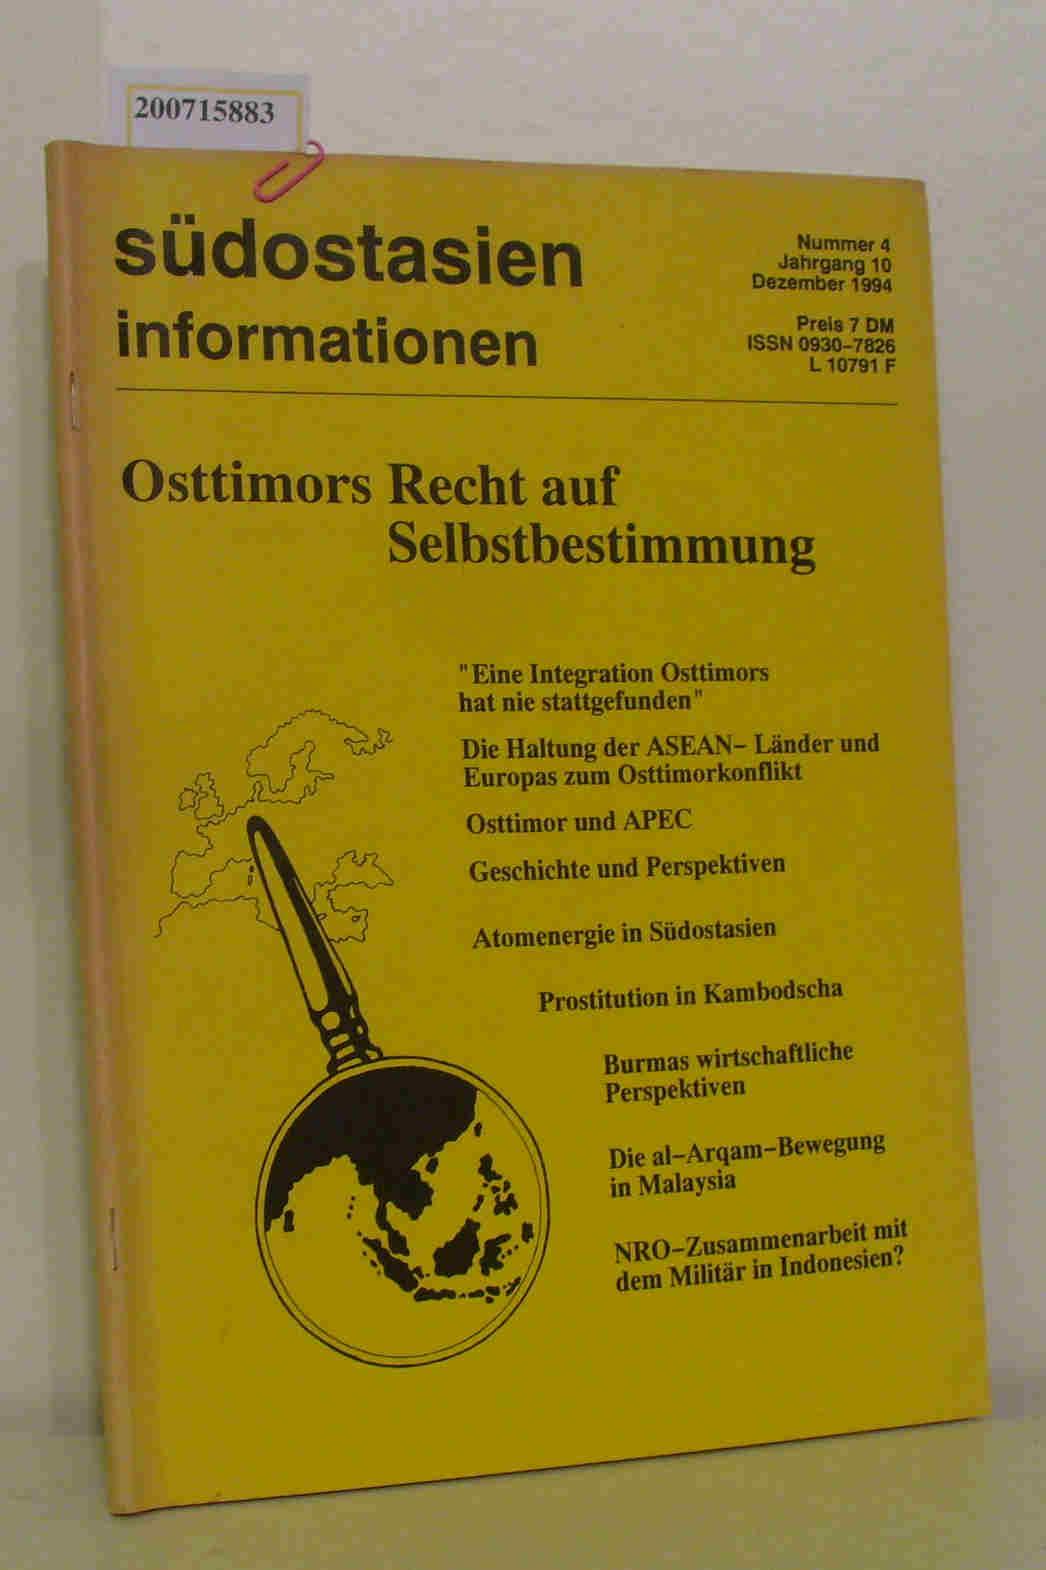 Südostasien Information Nr. 4, Jhrgang 10, März 1994 Osttimors Recht auf Selbstbestimmung